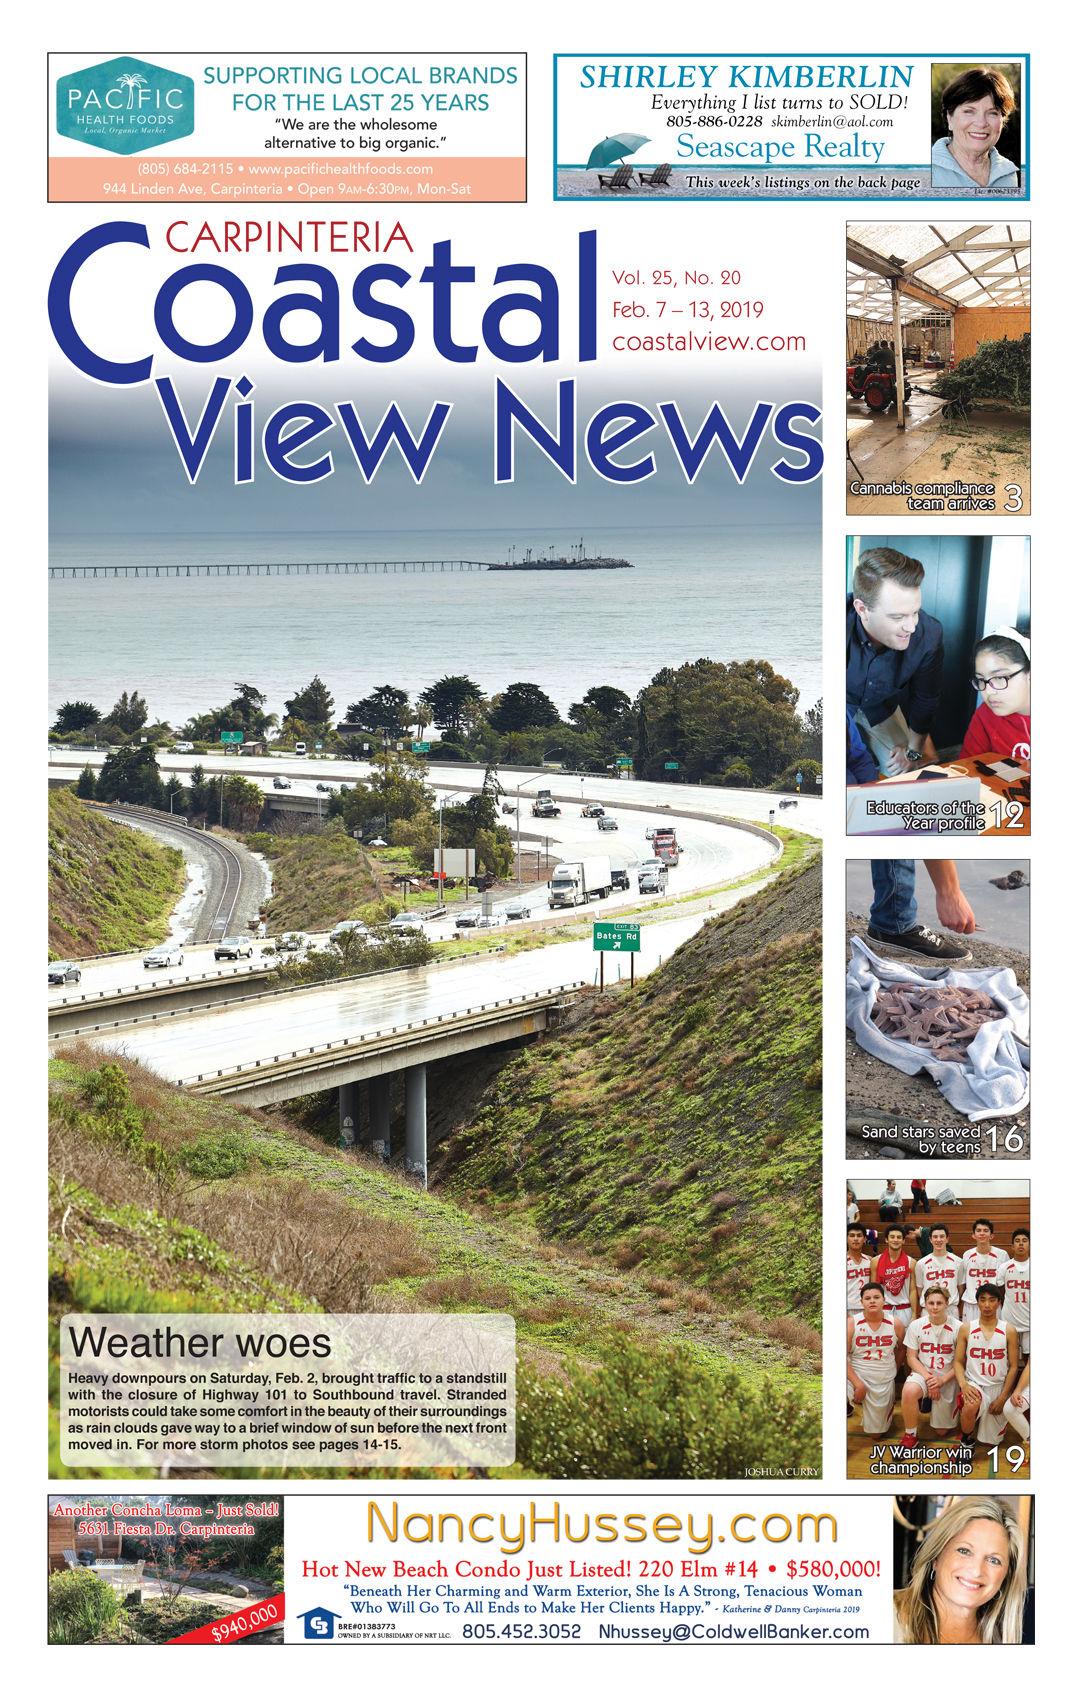 Coastal View News • February 7, 2019